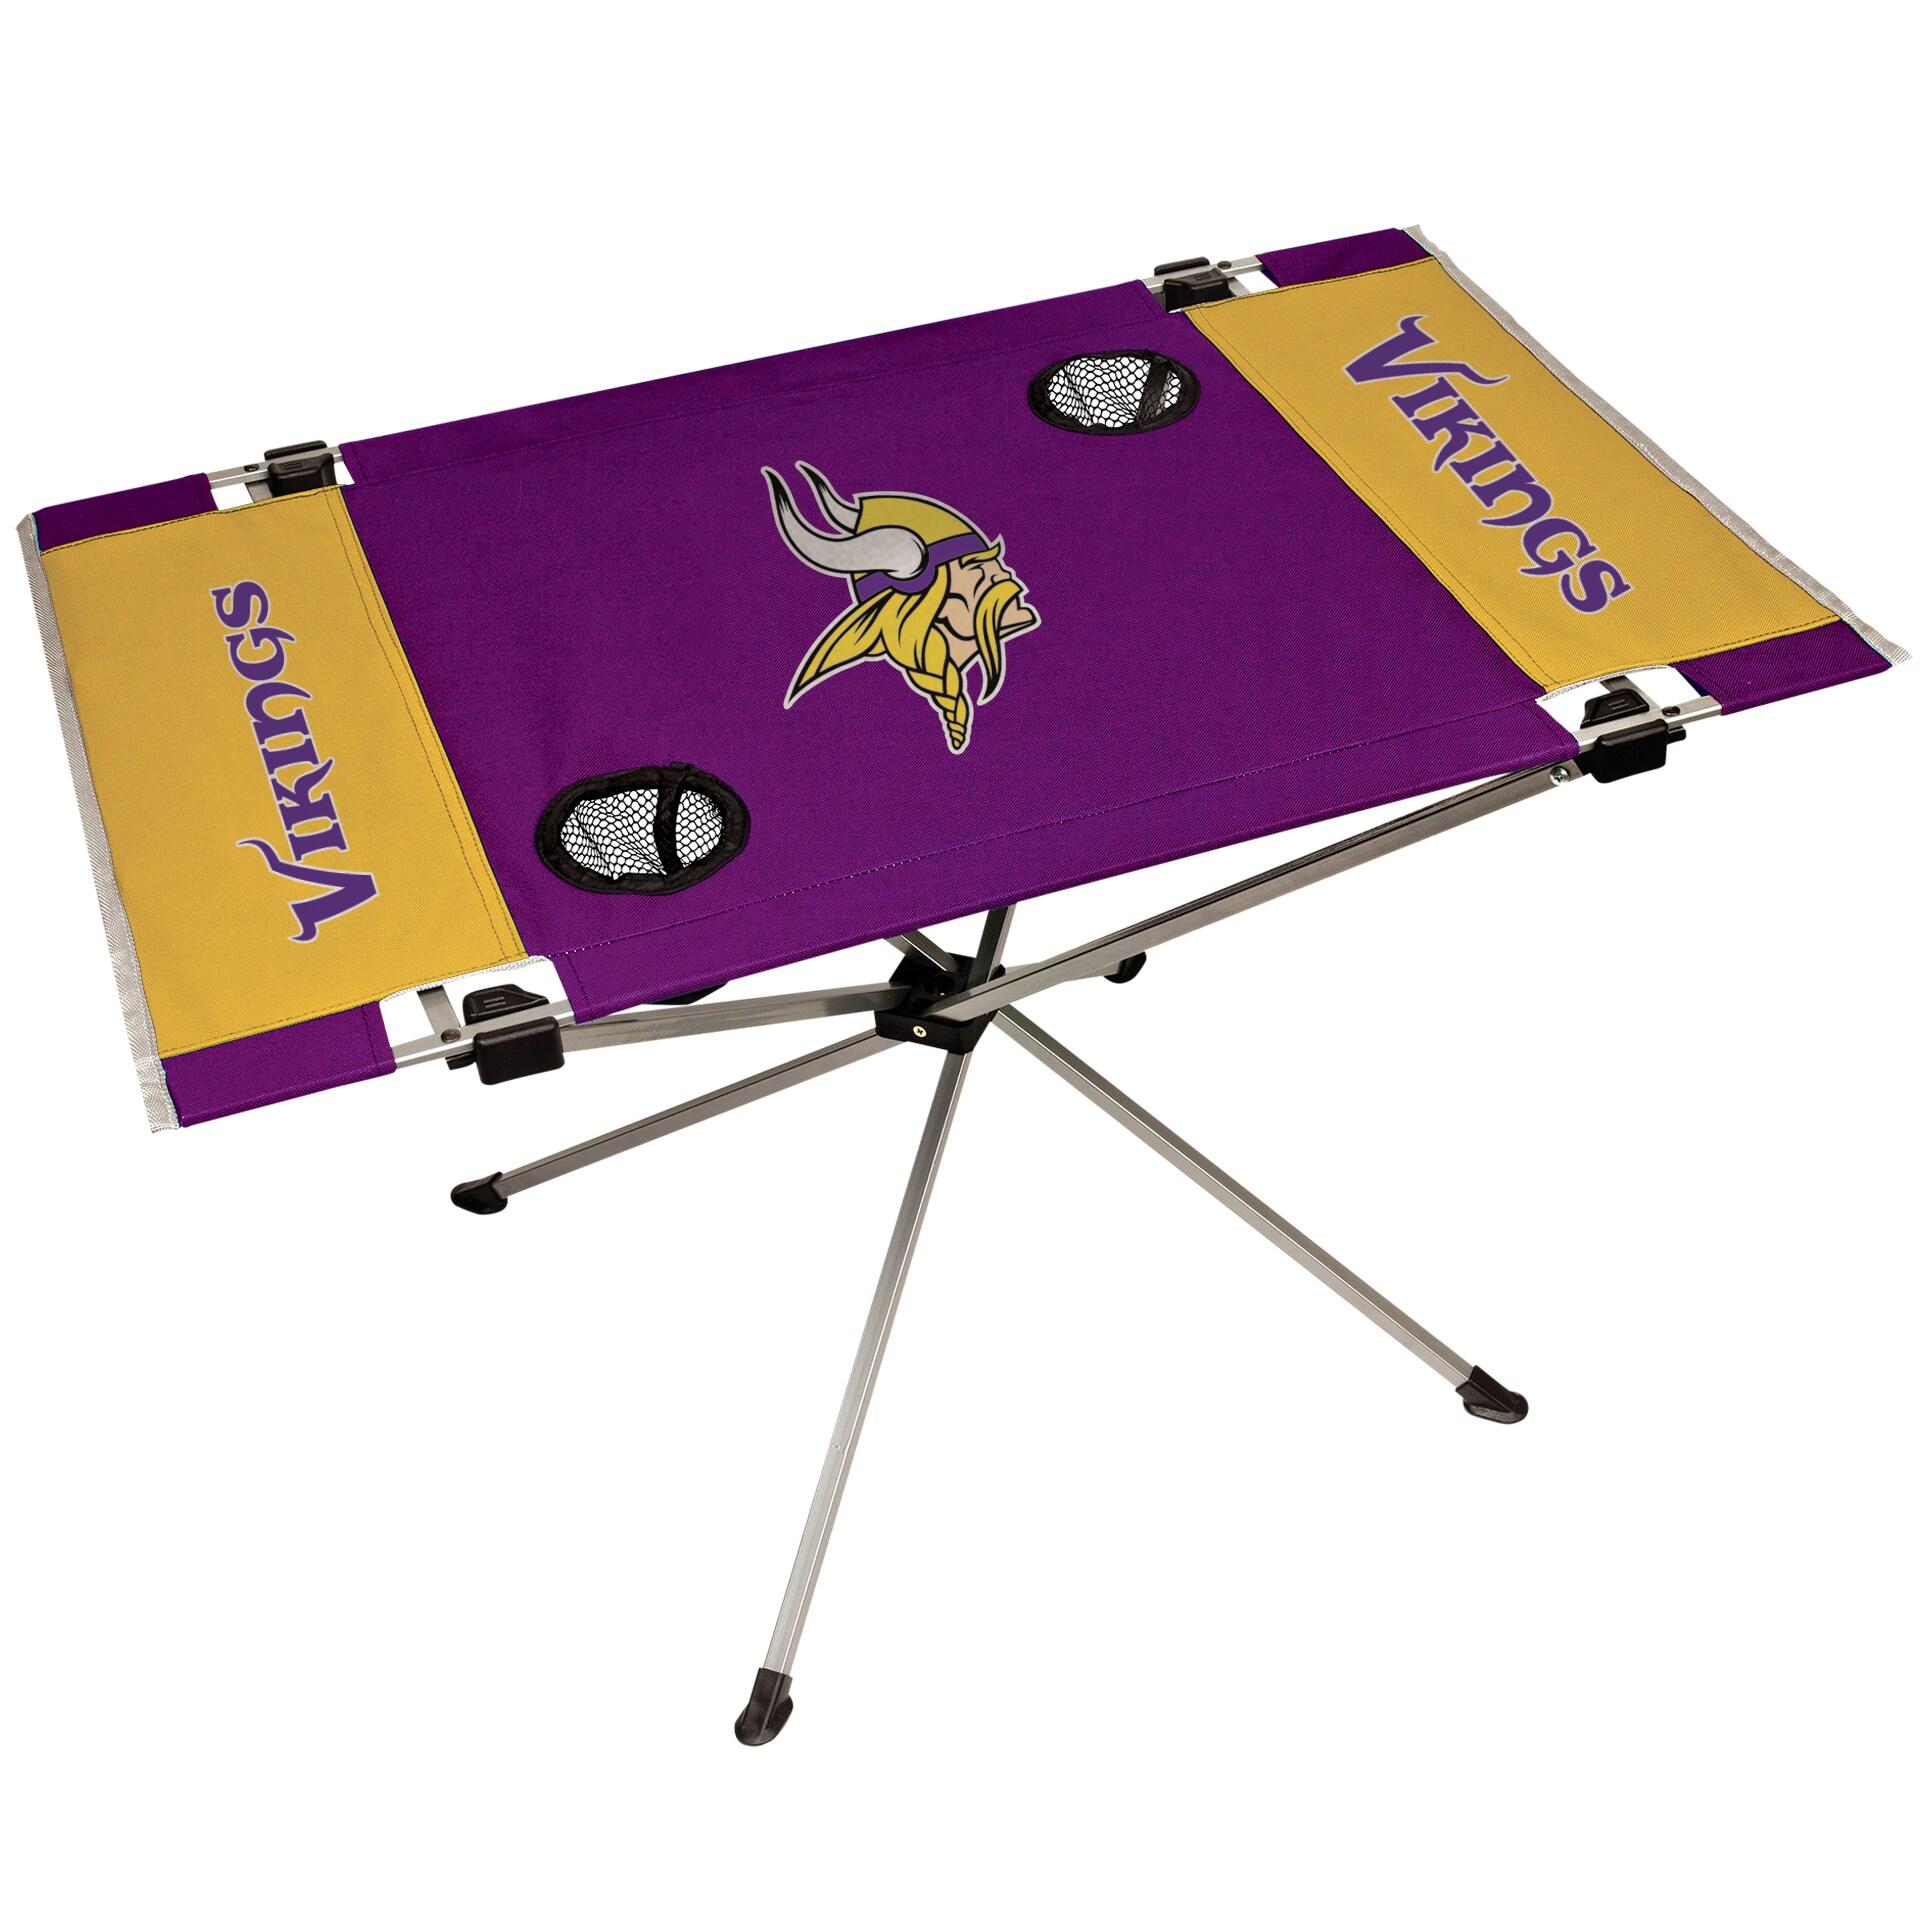 Minnesota Vikings End Zone Table